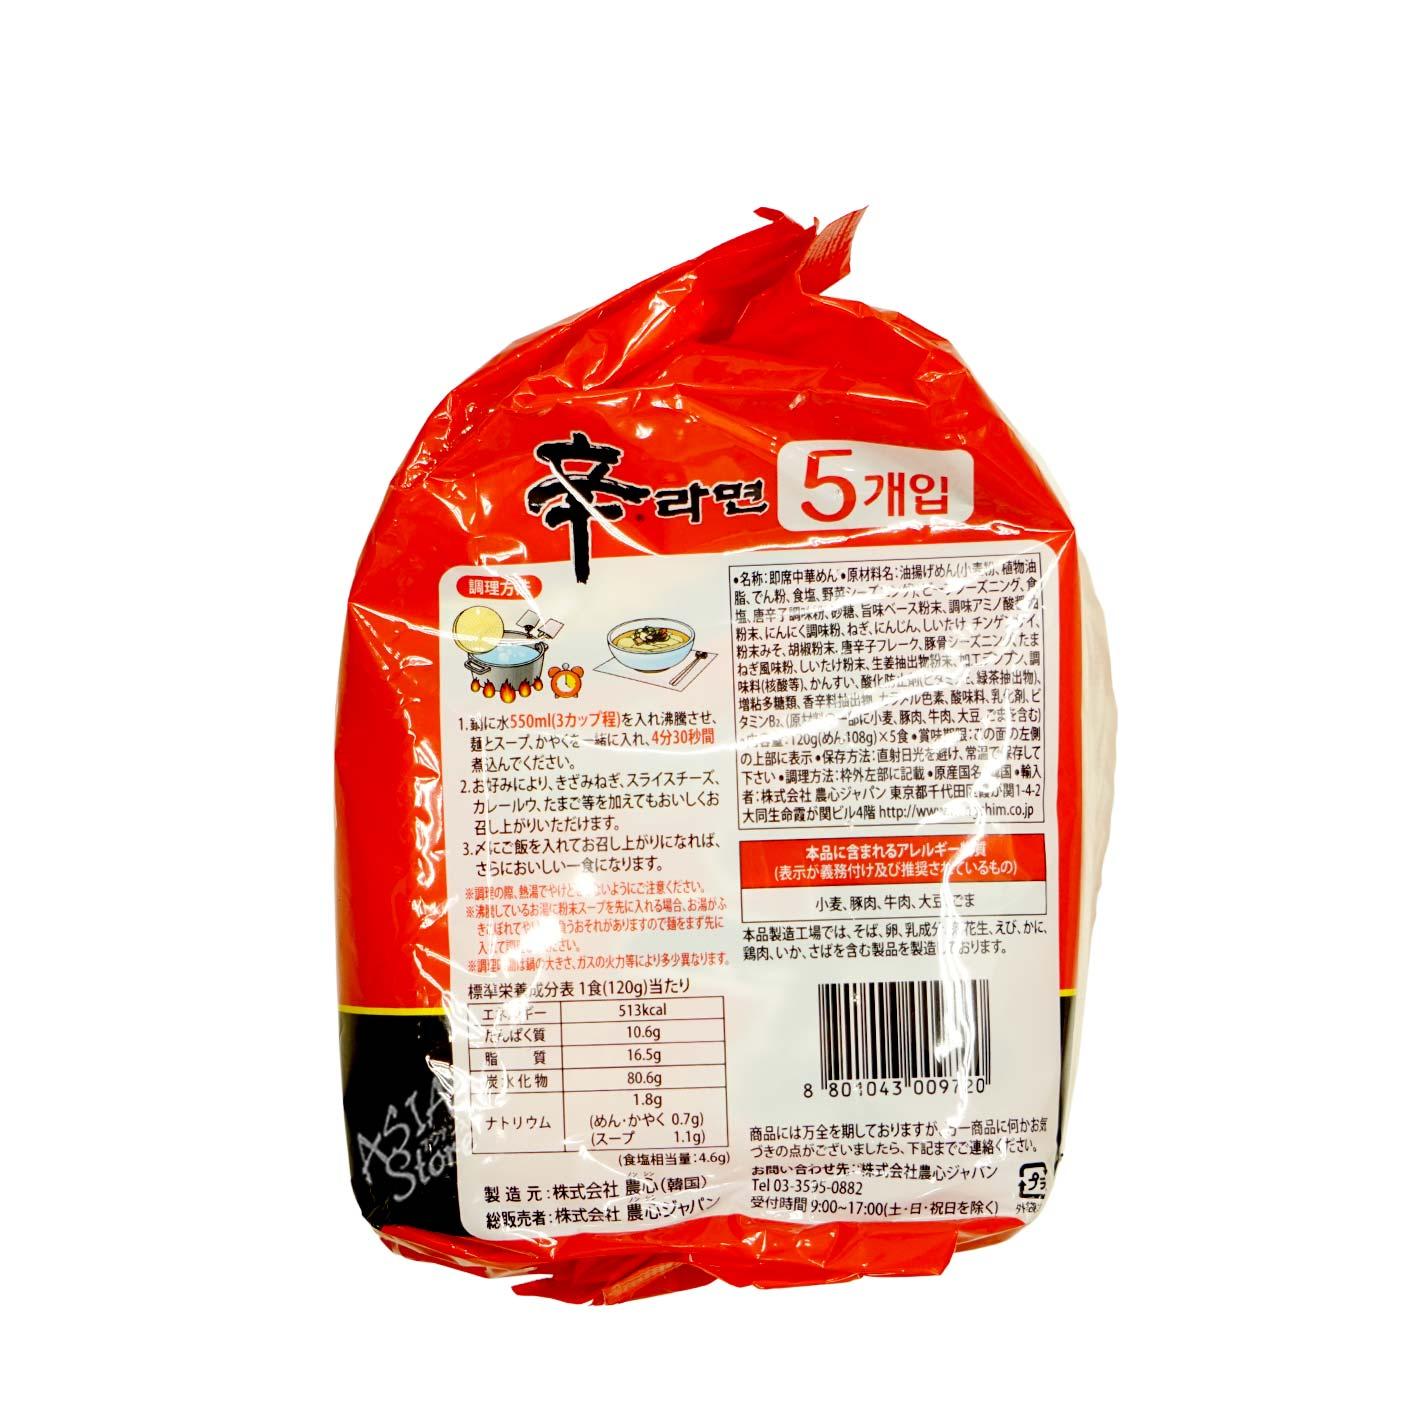 【常温便】韓国農心辛ラーメン/韓国辛拉面(120g*5)